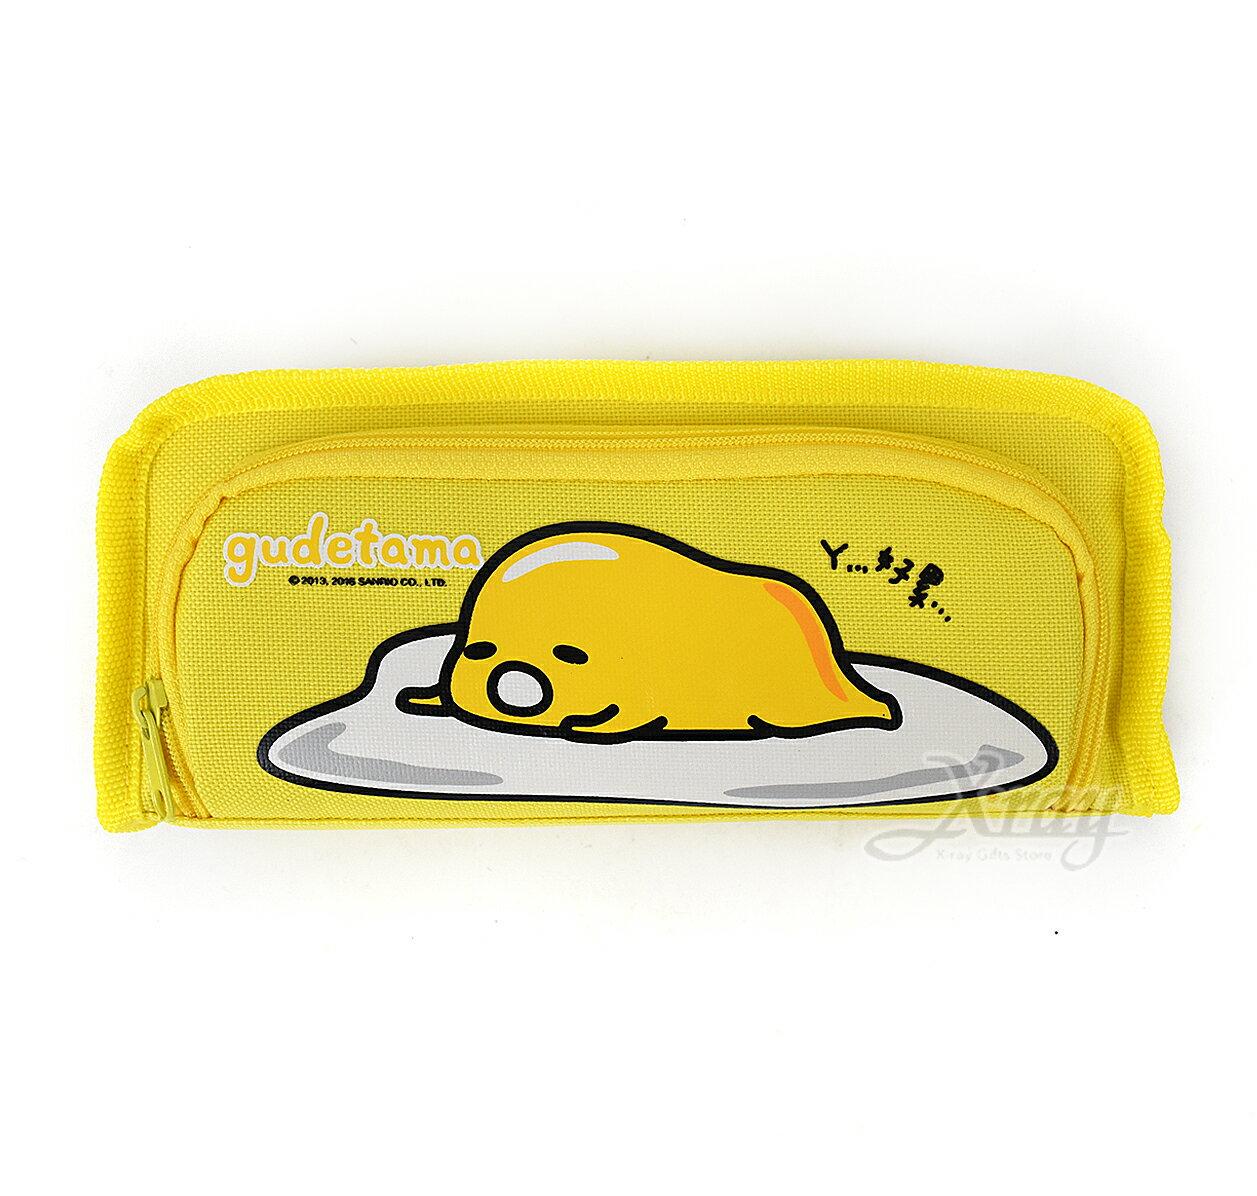 X射線【C662560】蛋黃哥環保材質筆袋,鉛筆盒/面紙包/化妝包/零錢包/收納包/皮夾/手機袋/鑰匙包